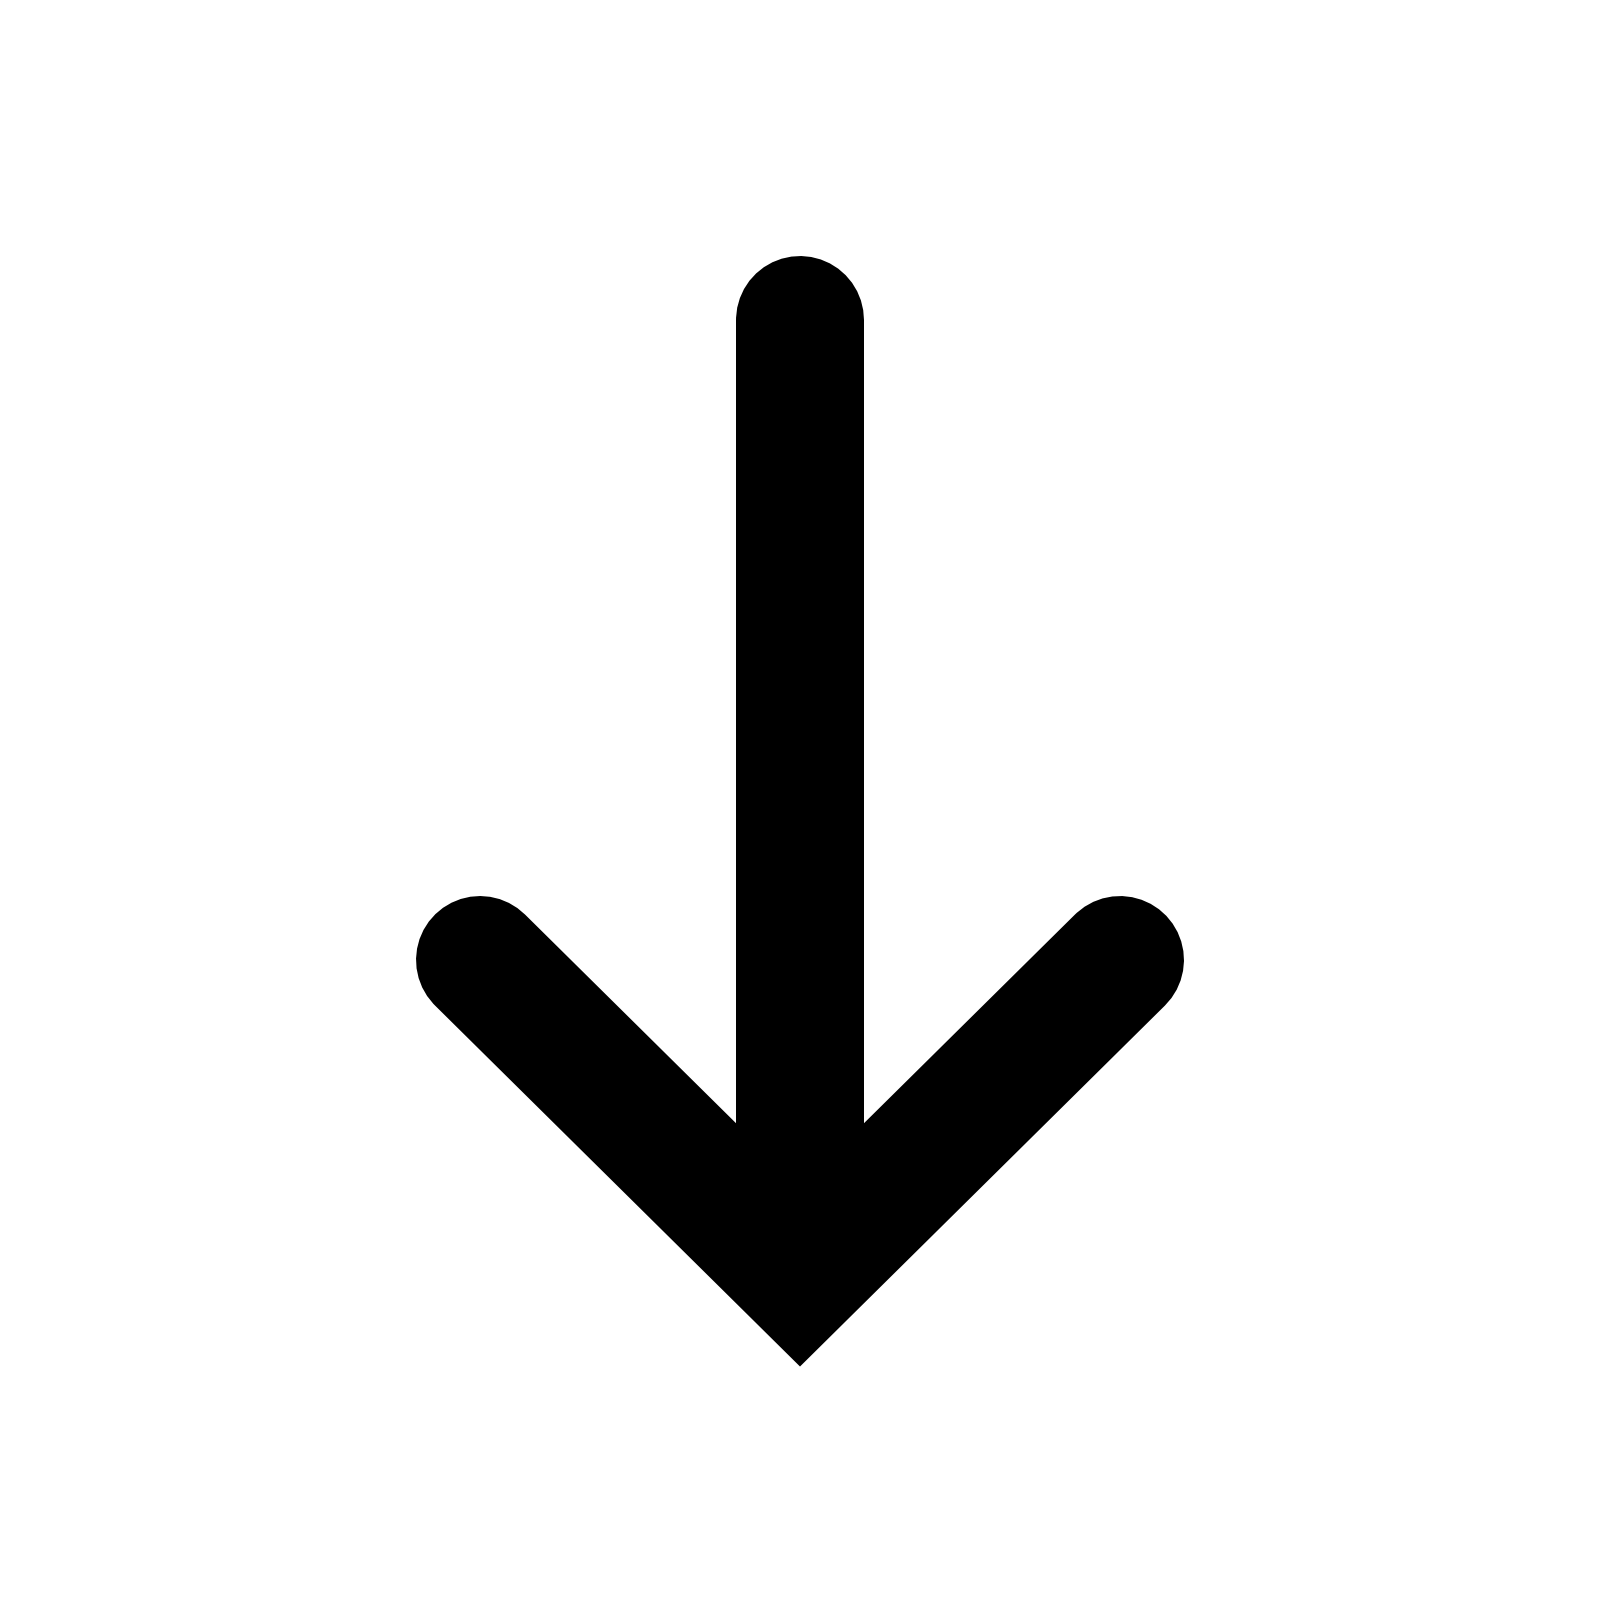 Logo Arrow PNG Transparent Logo Arrow.PNG Images.   PlusPNG